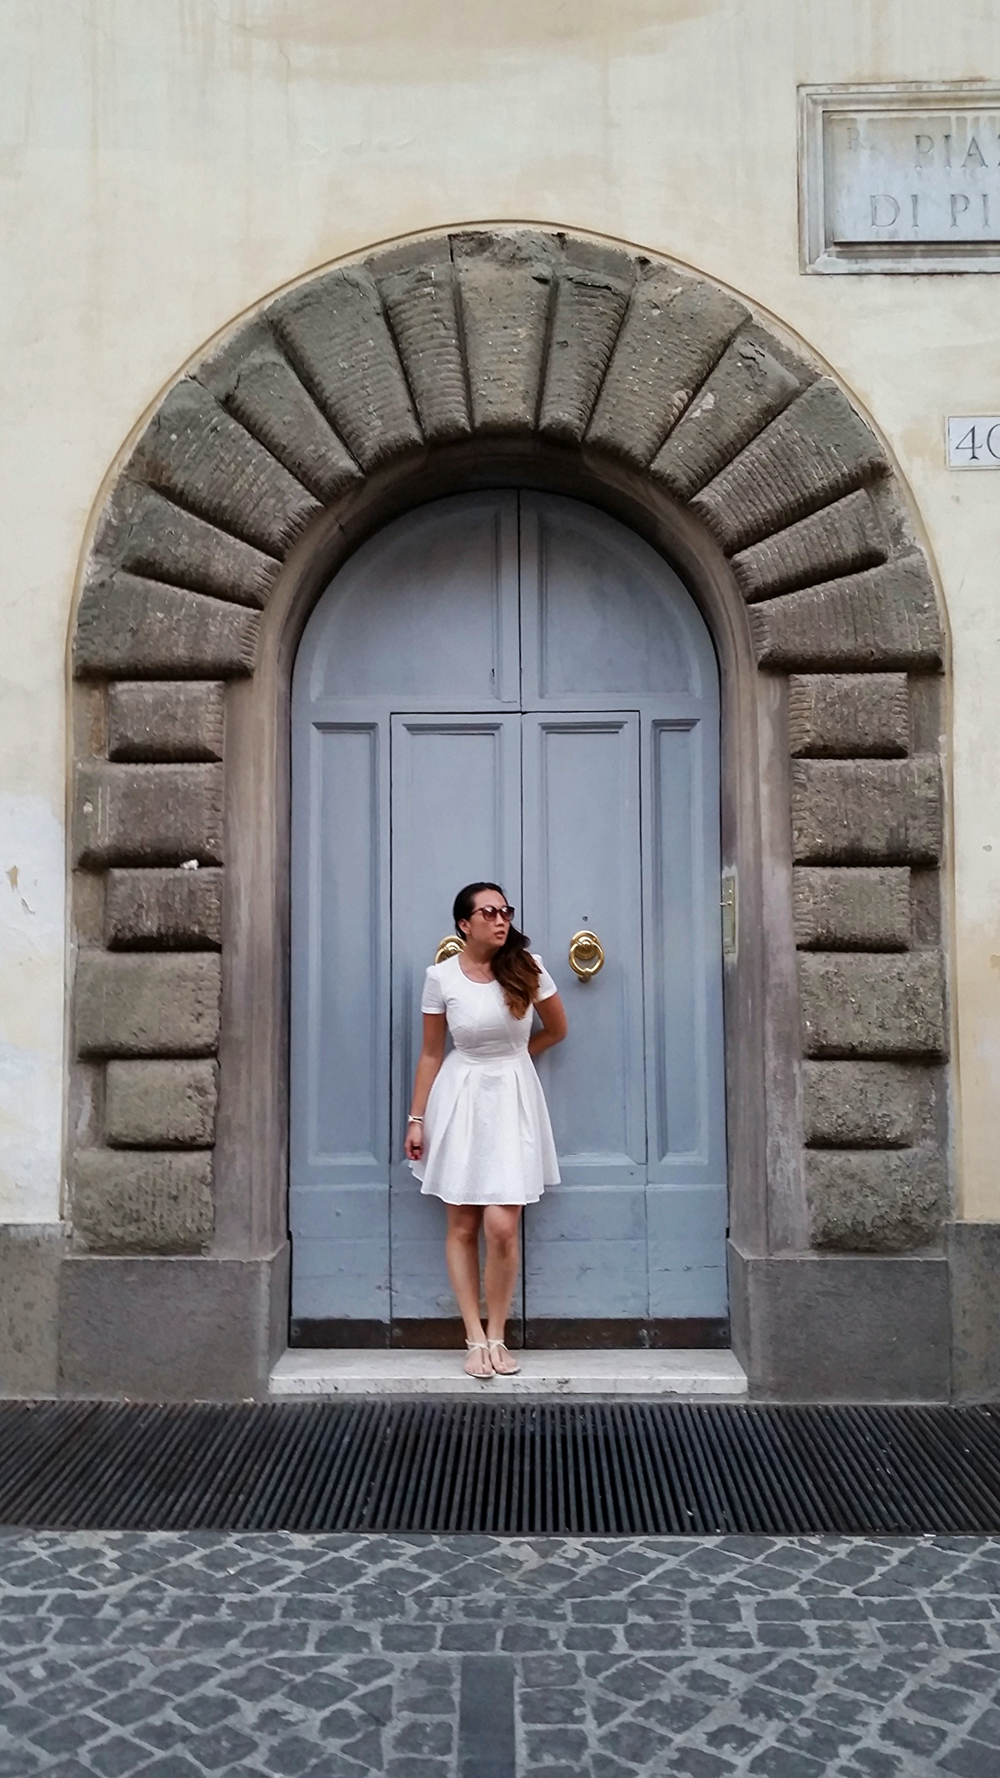 MONTI, ROME Stone hues